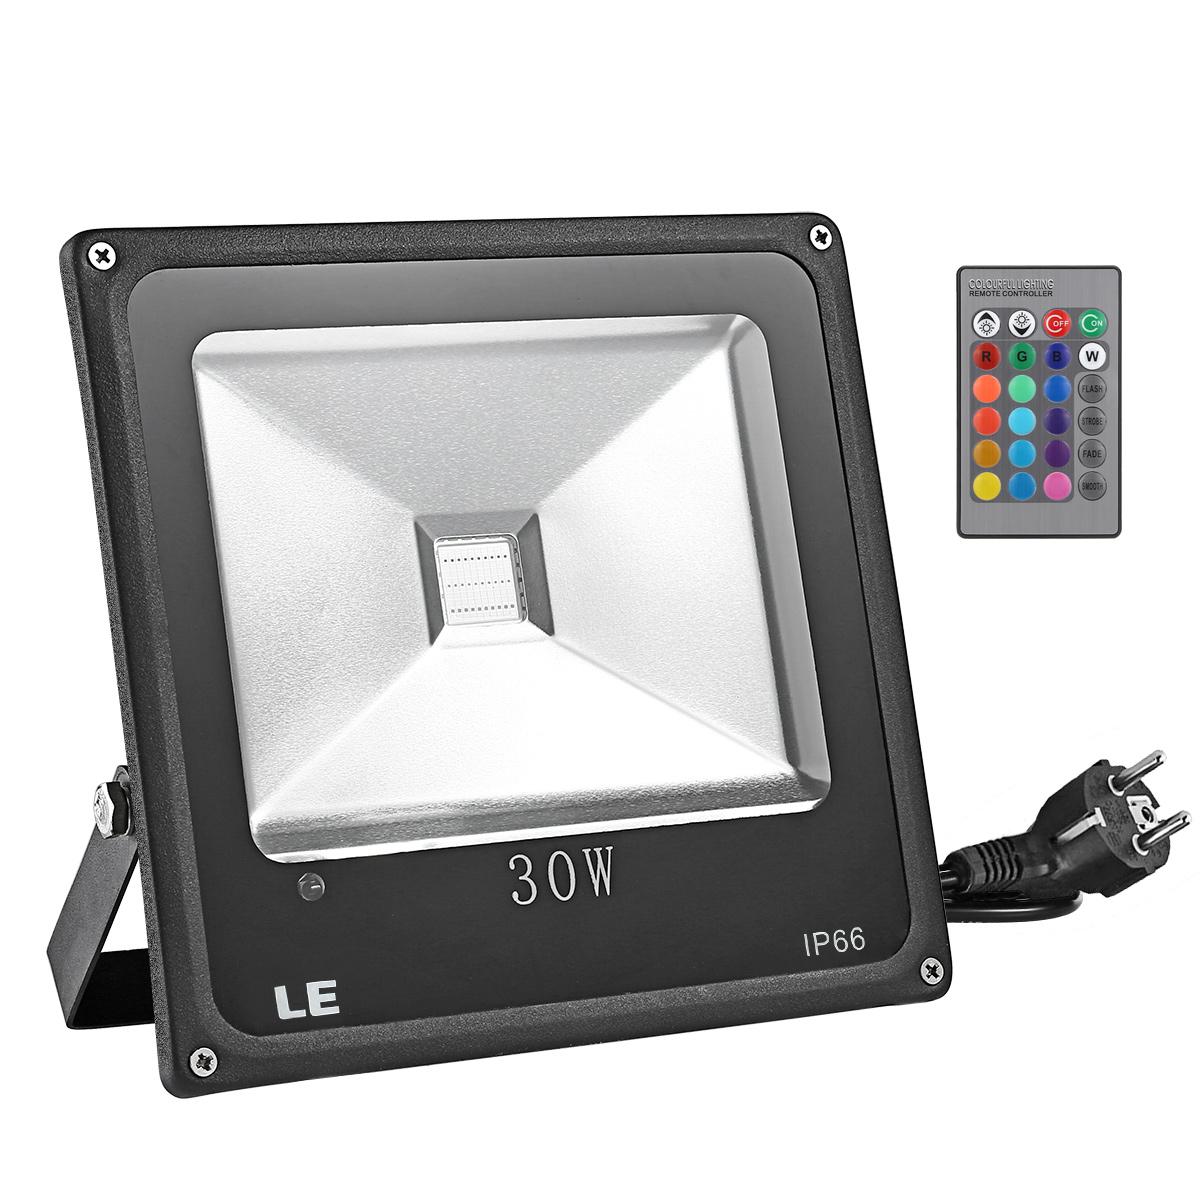 30W LED RGB Strahler, fernbedient Fluter, 16 Farben & 4 Modi, Wasserdicht, Farbwechsel